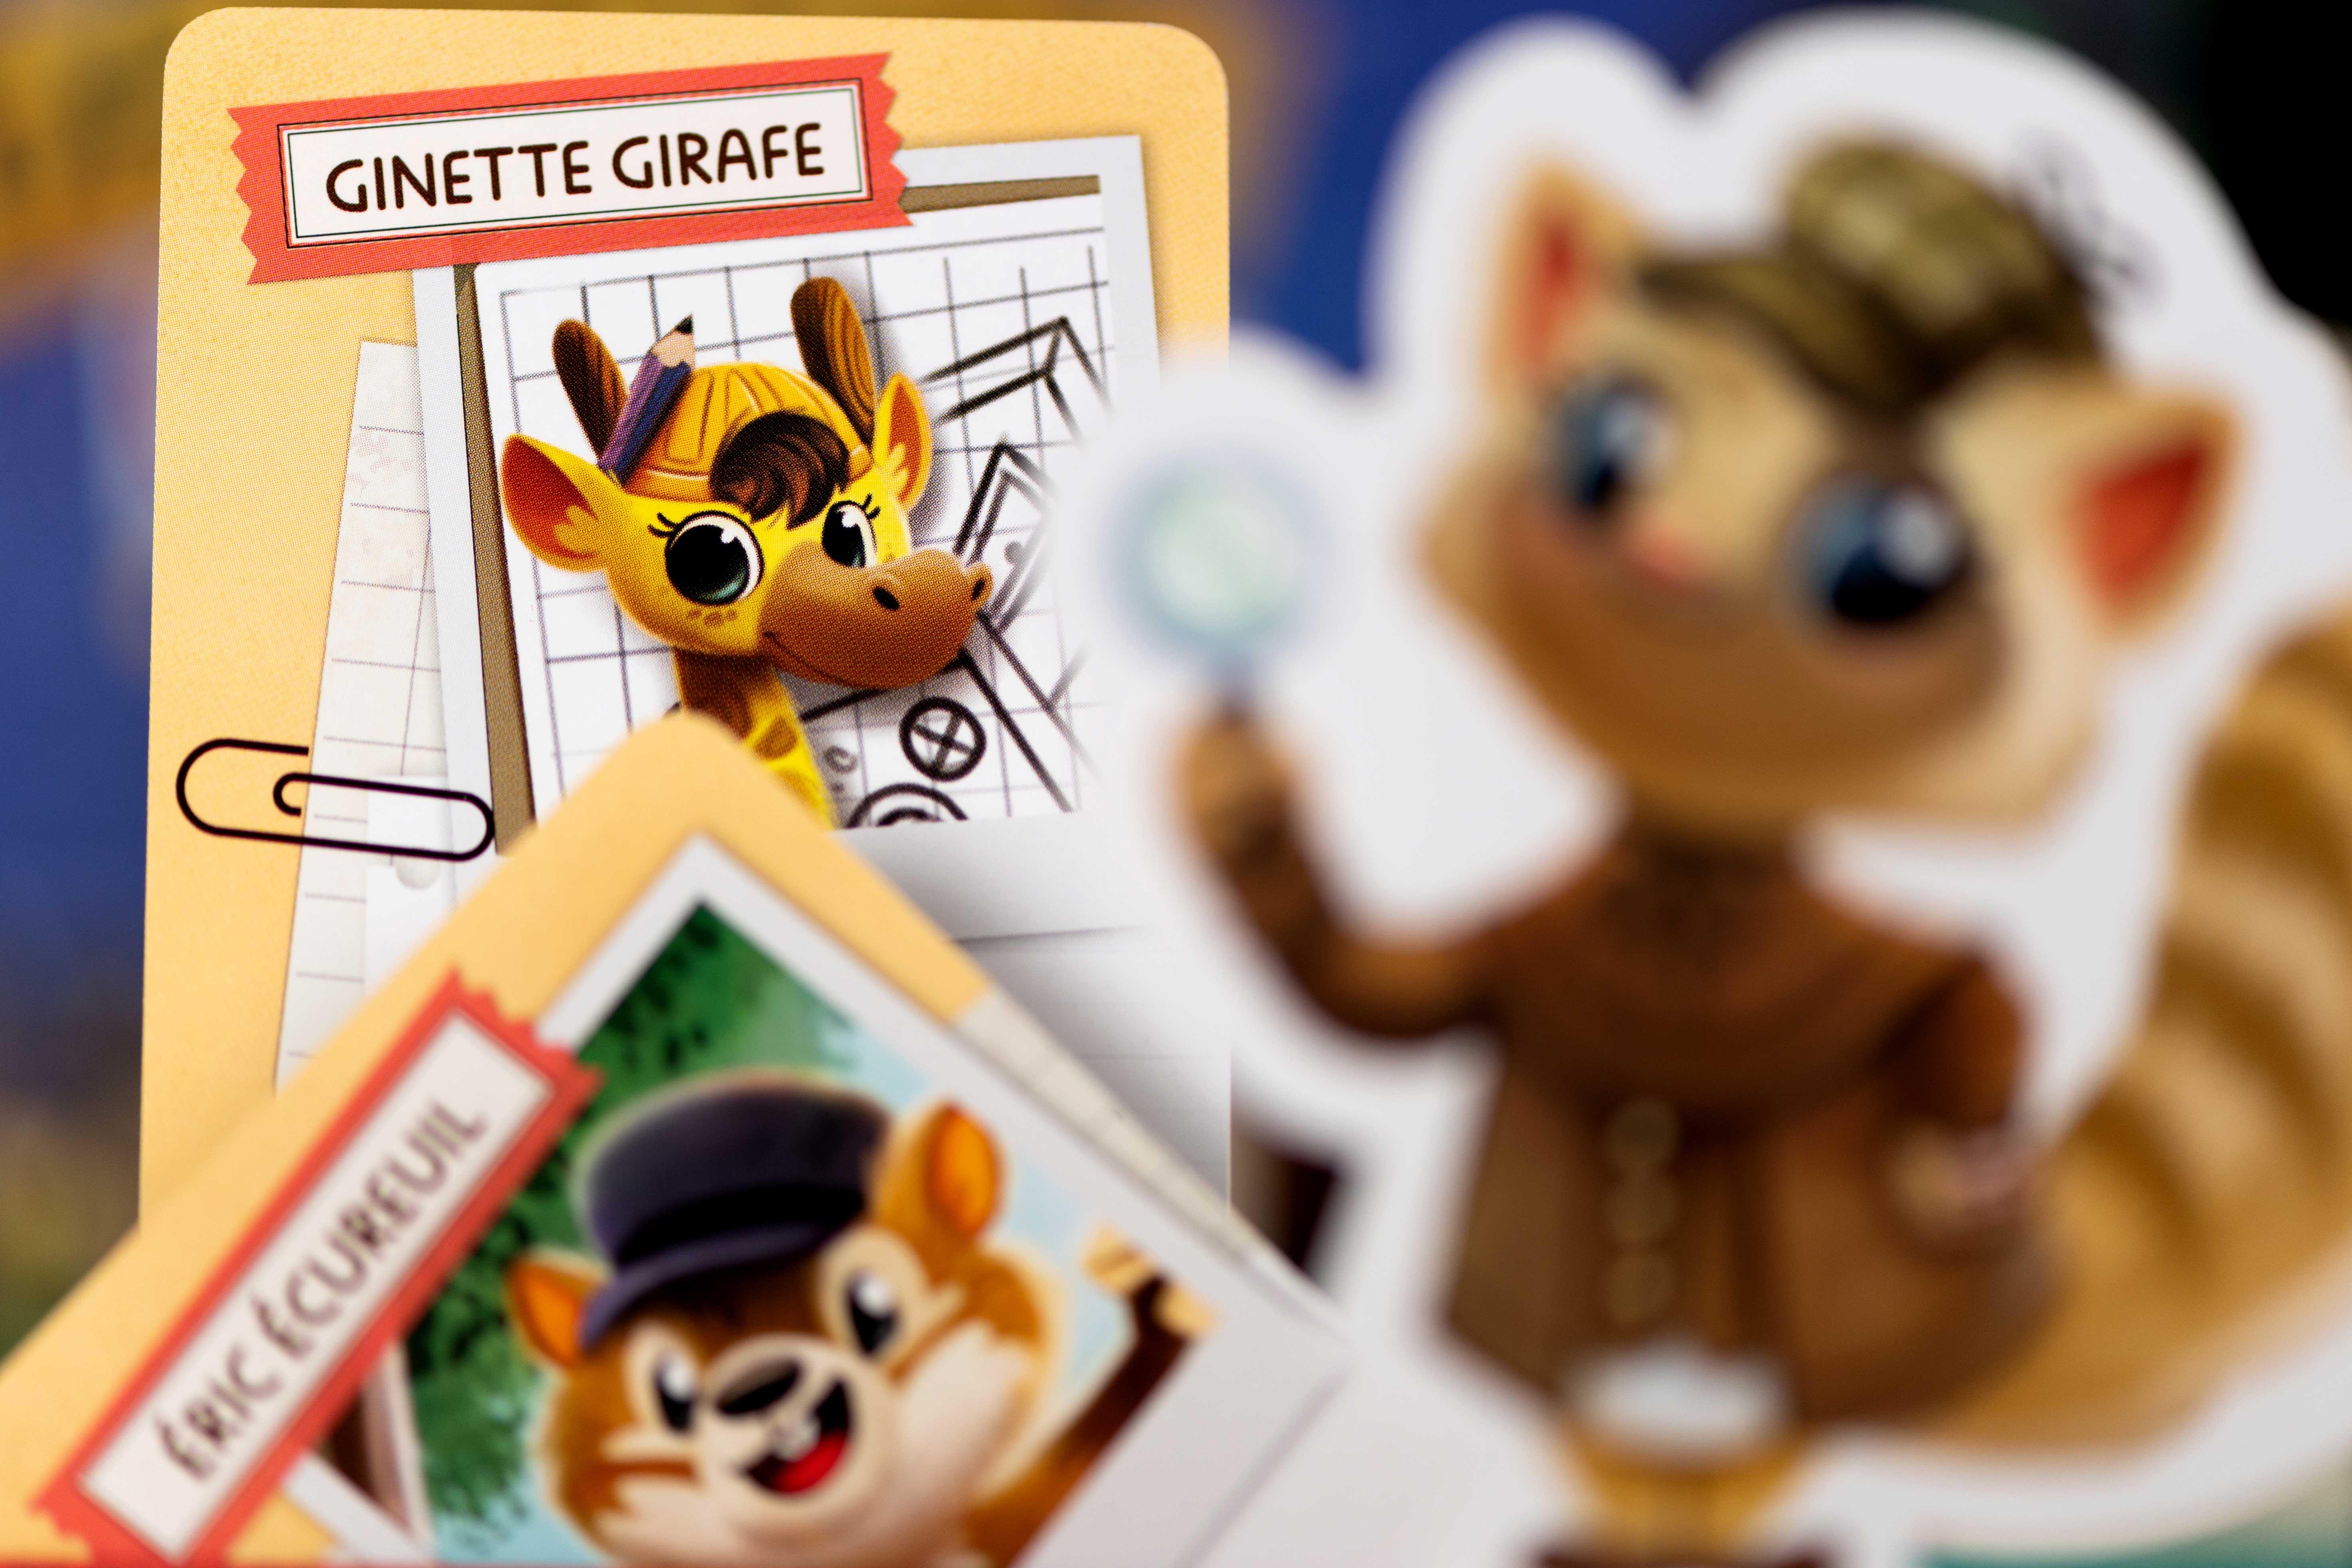 Detective Charlie 5